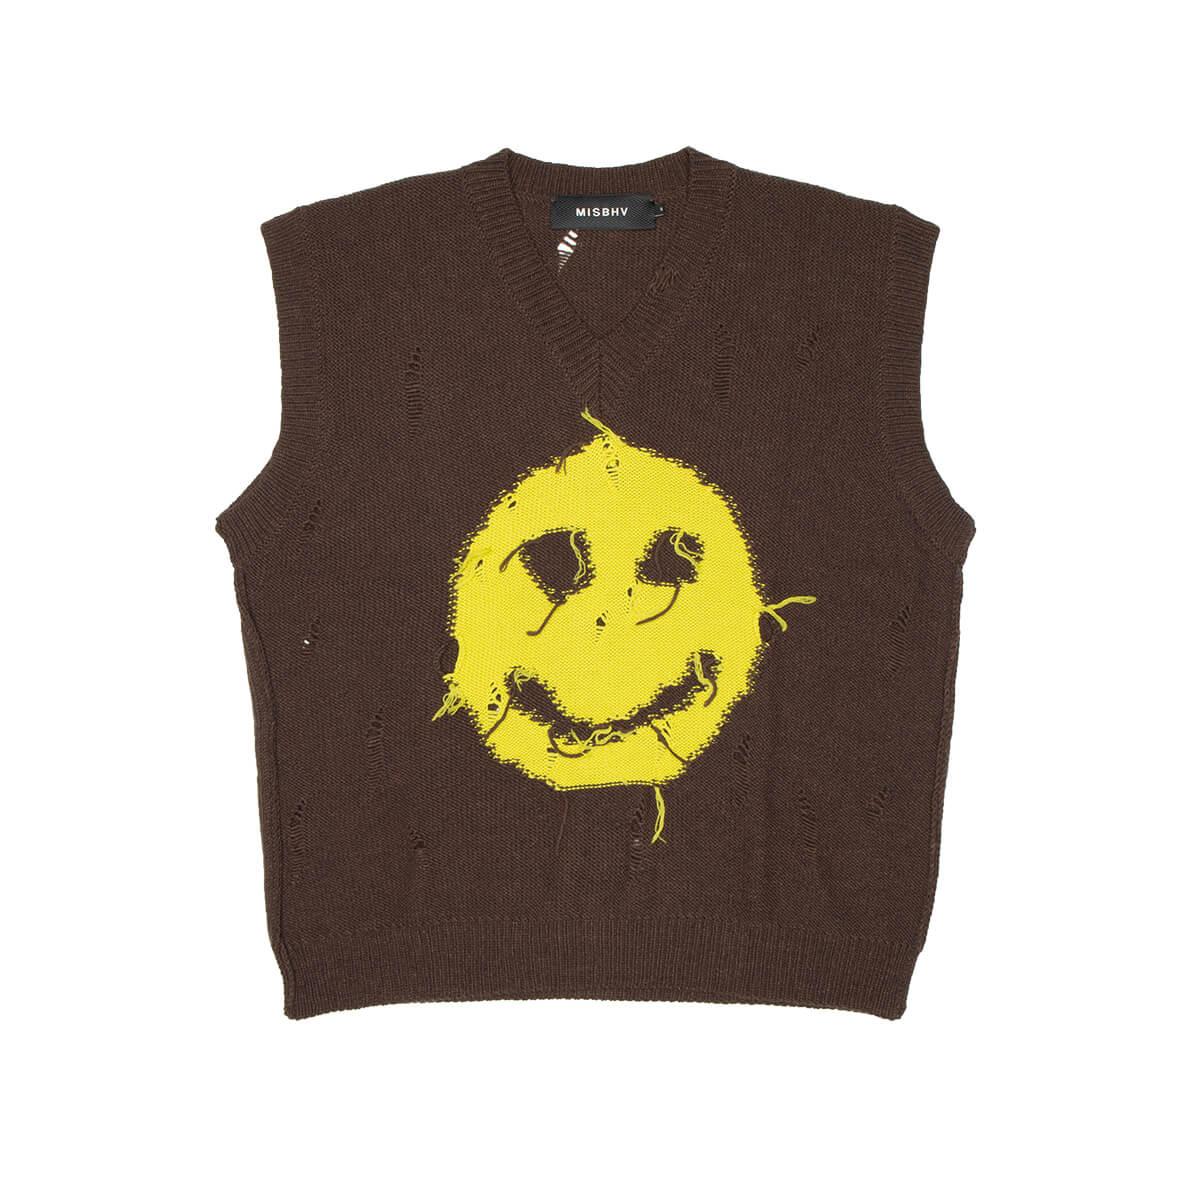 MISBHV Smiley Sleeveless Sweater